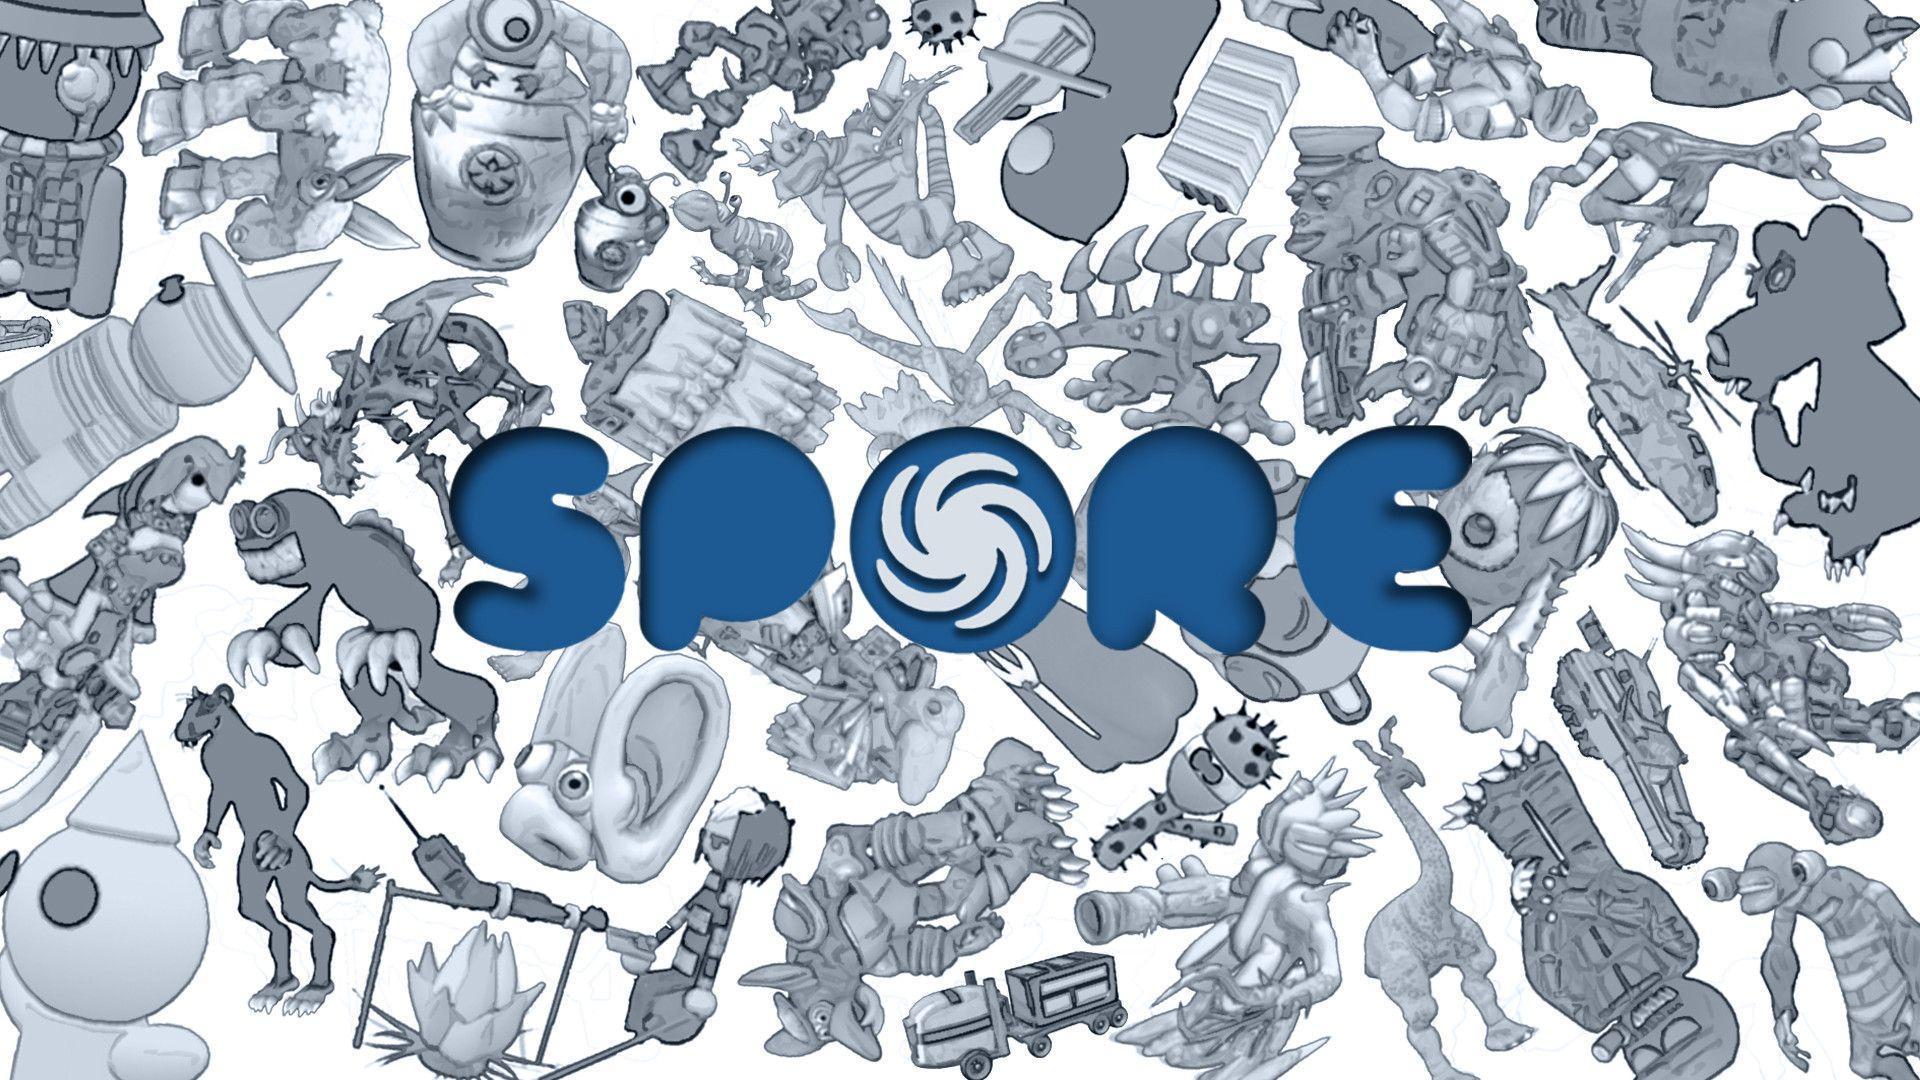 Spore Wallpaper